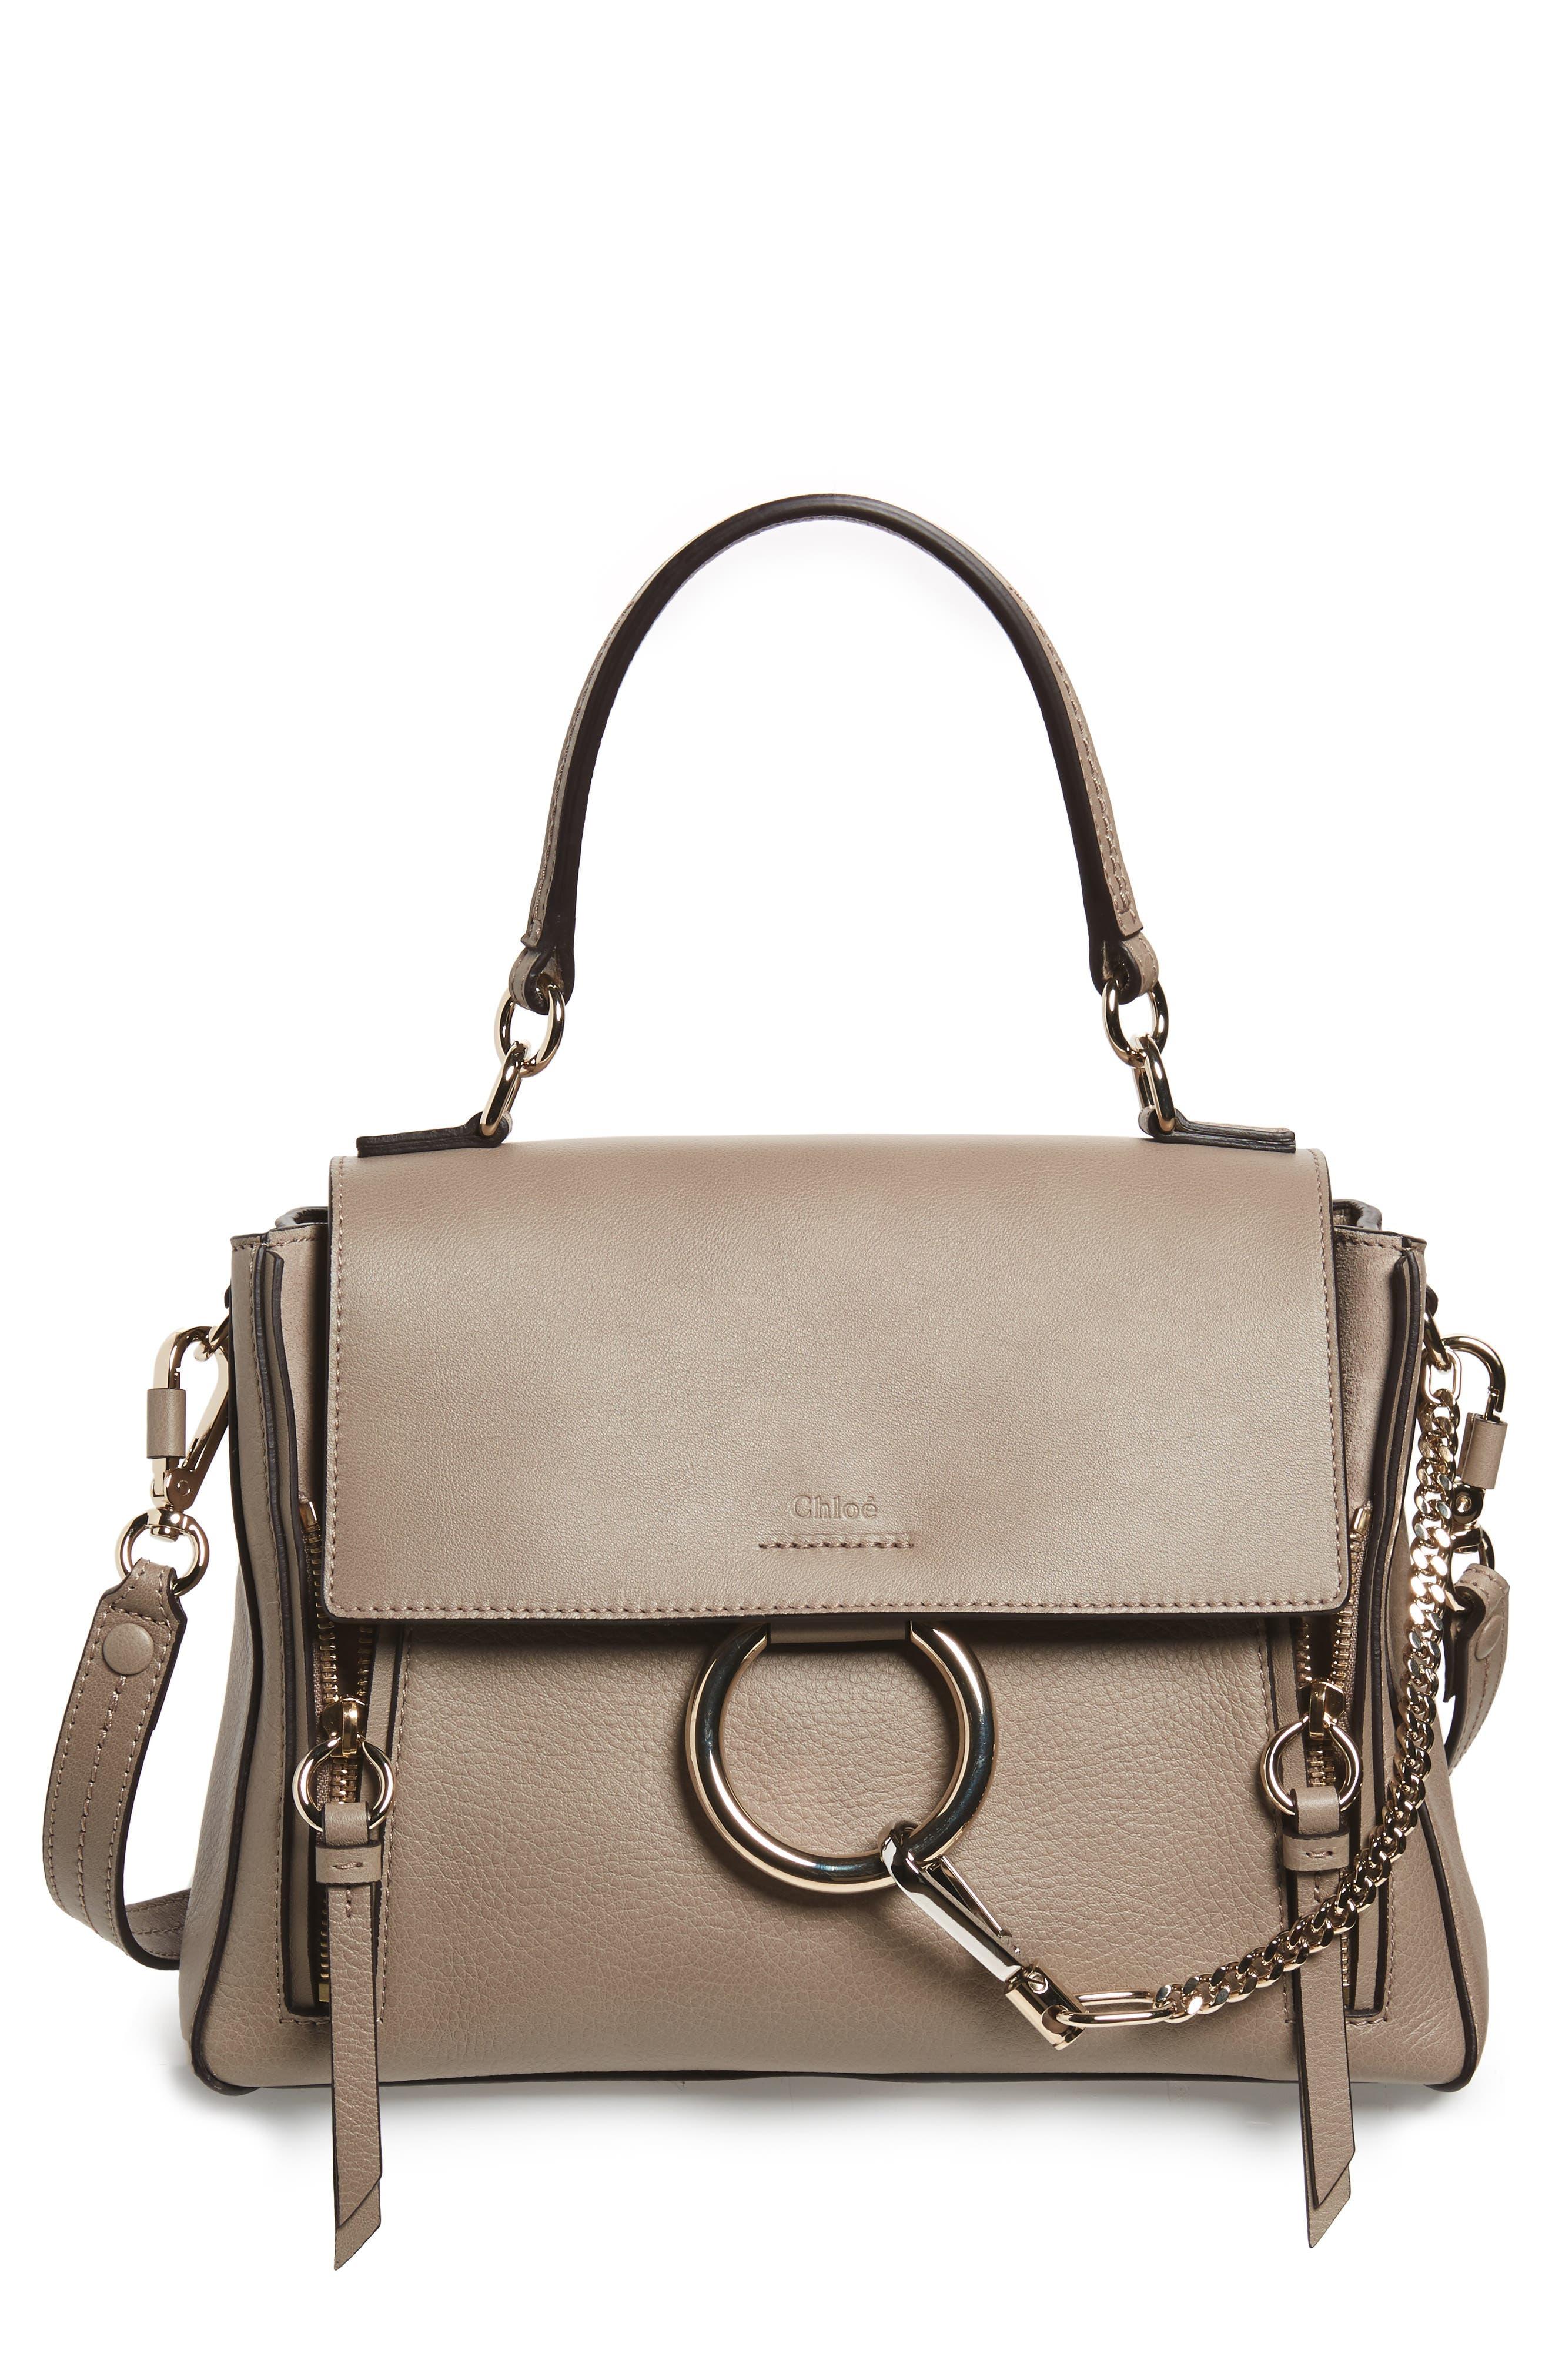 bag chloe fashion cross body style